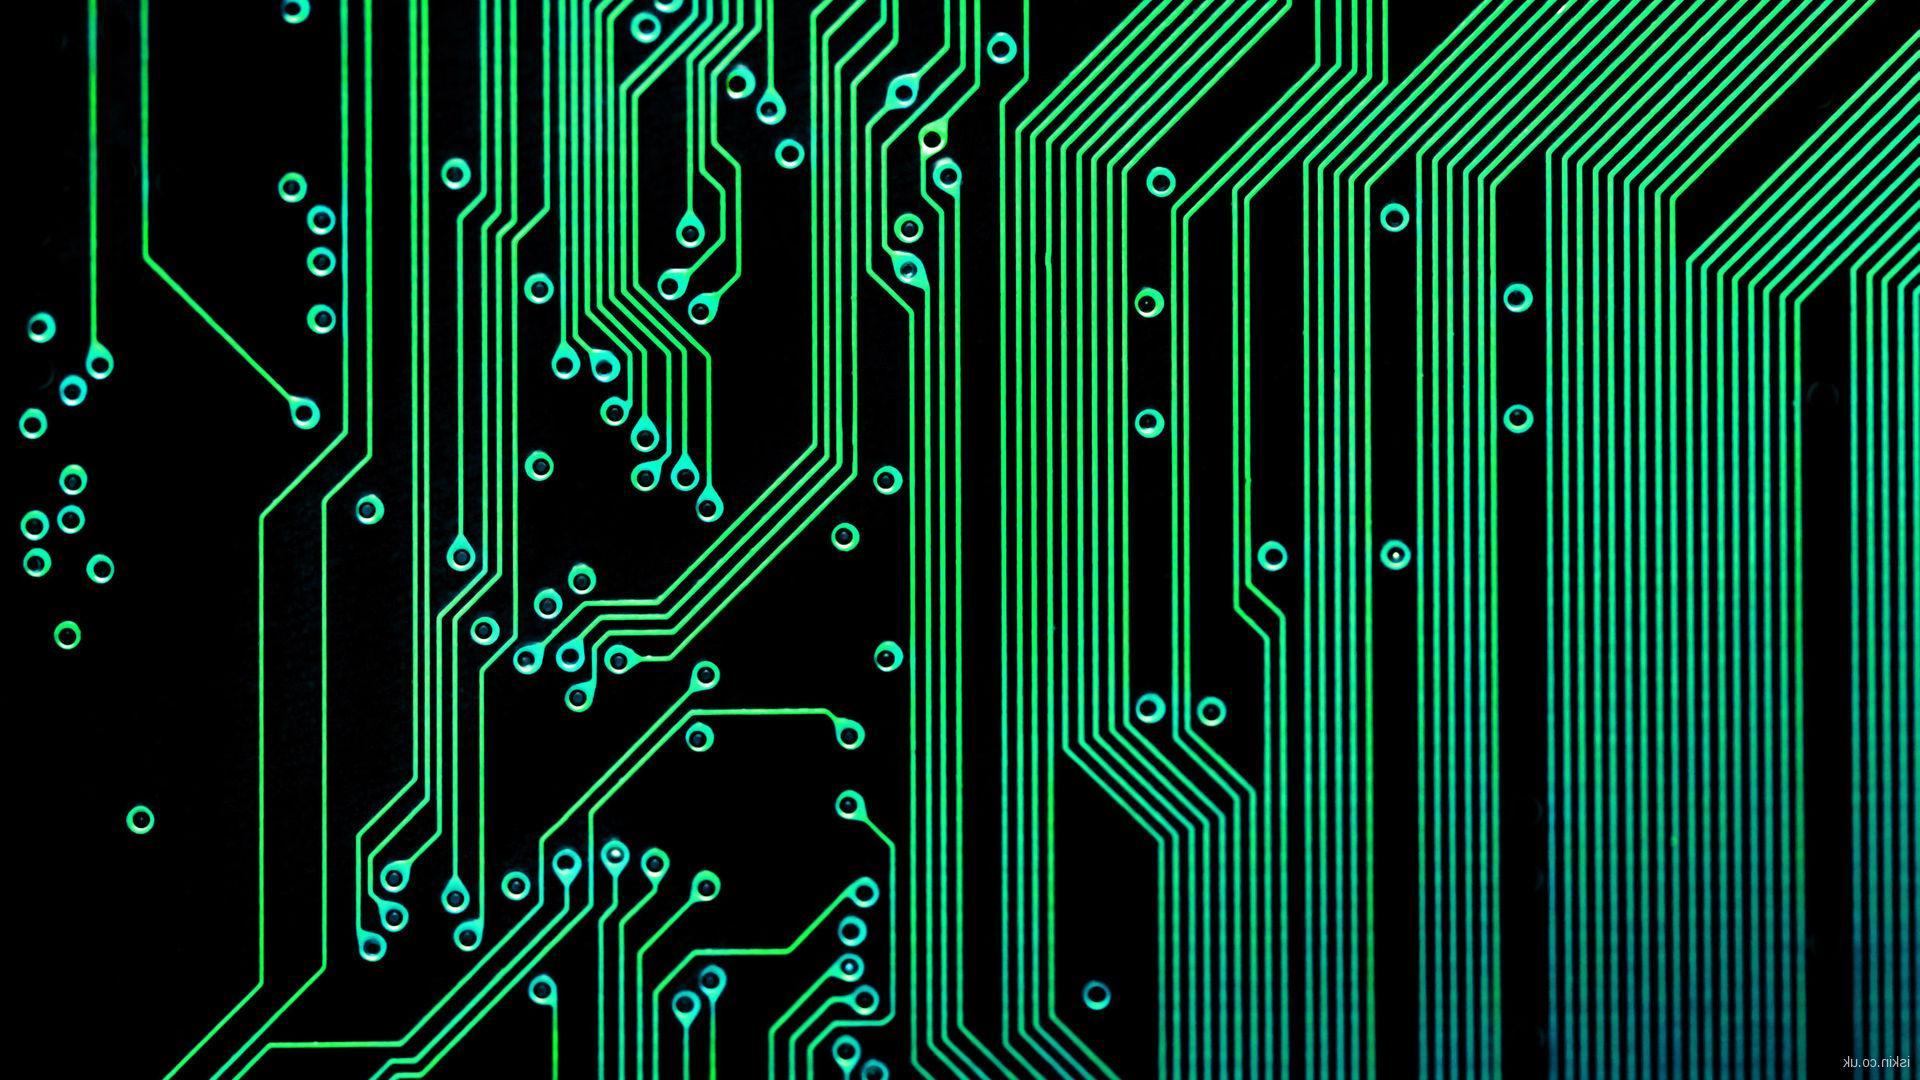 Electronic Circuit HD Wallpaper   1920x1080   ID:36369 ...